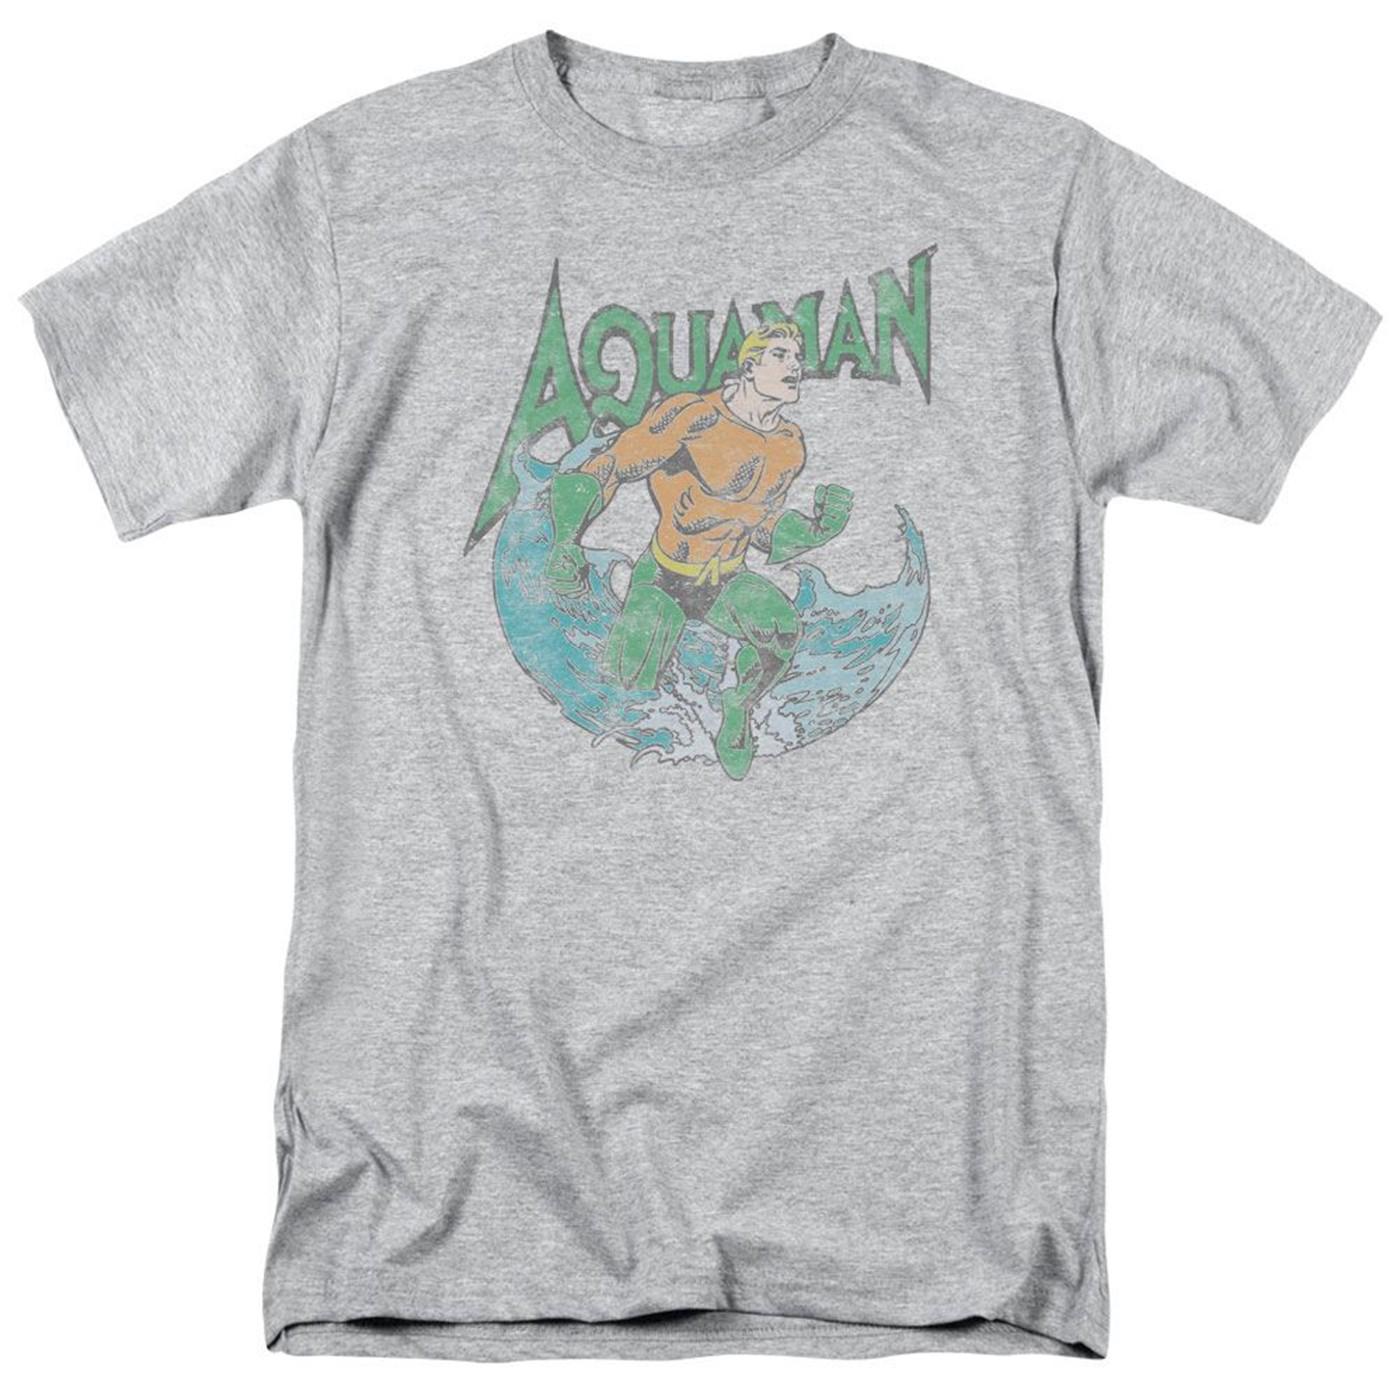 Aquaman Pose Grey Men's T-Shirt